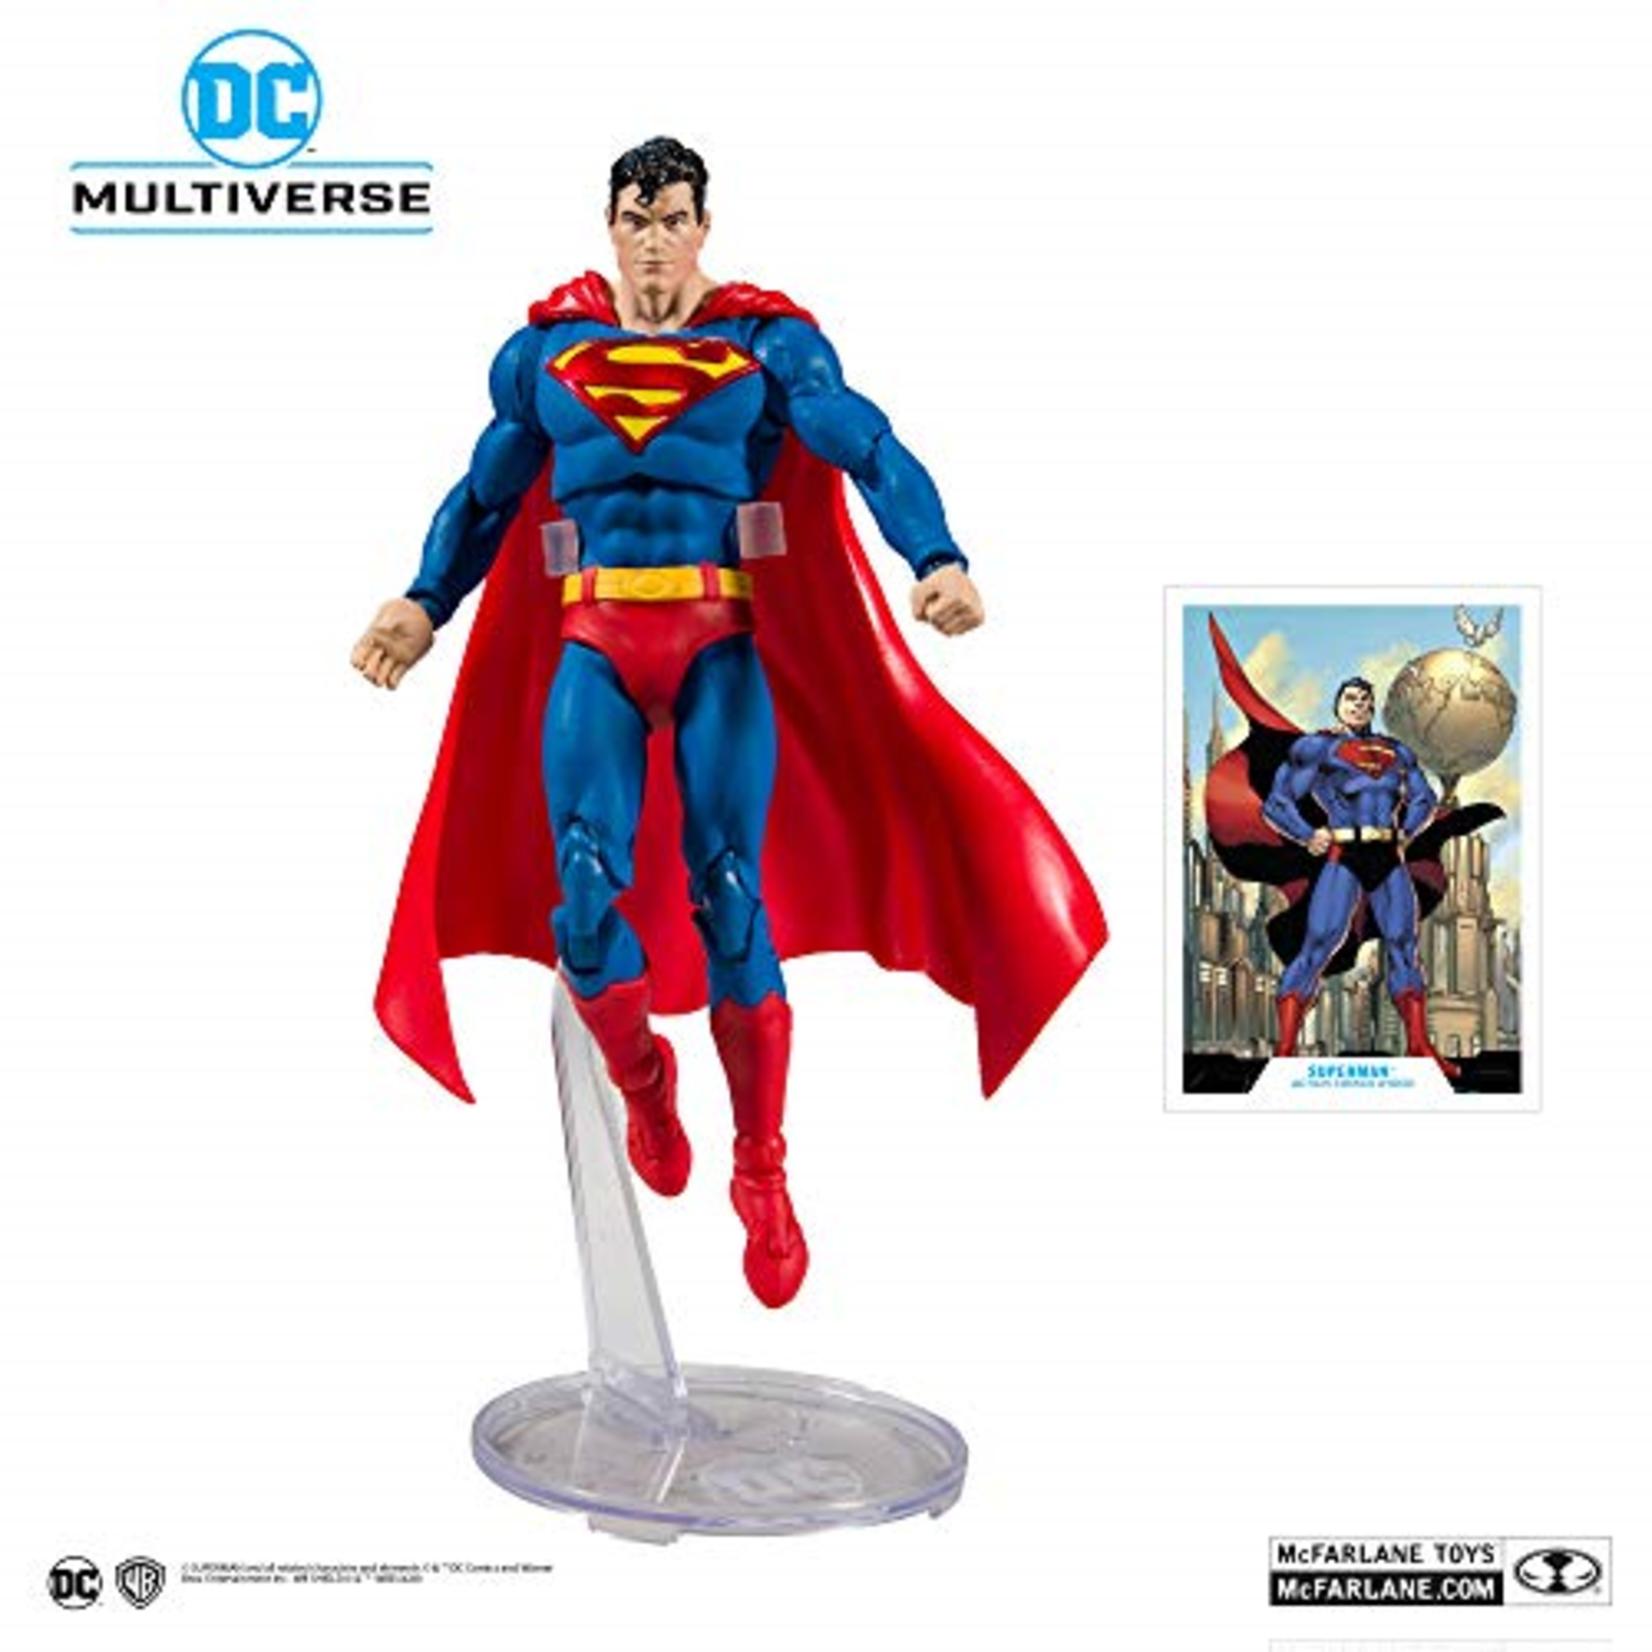 McFarlane Toys McFarlane Toys - DC Multiverse Superman